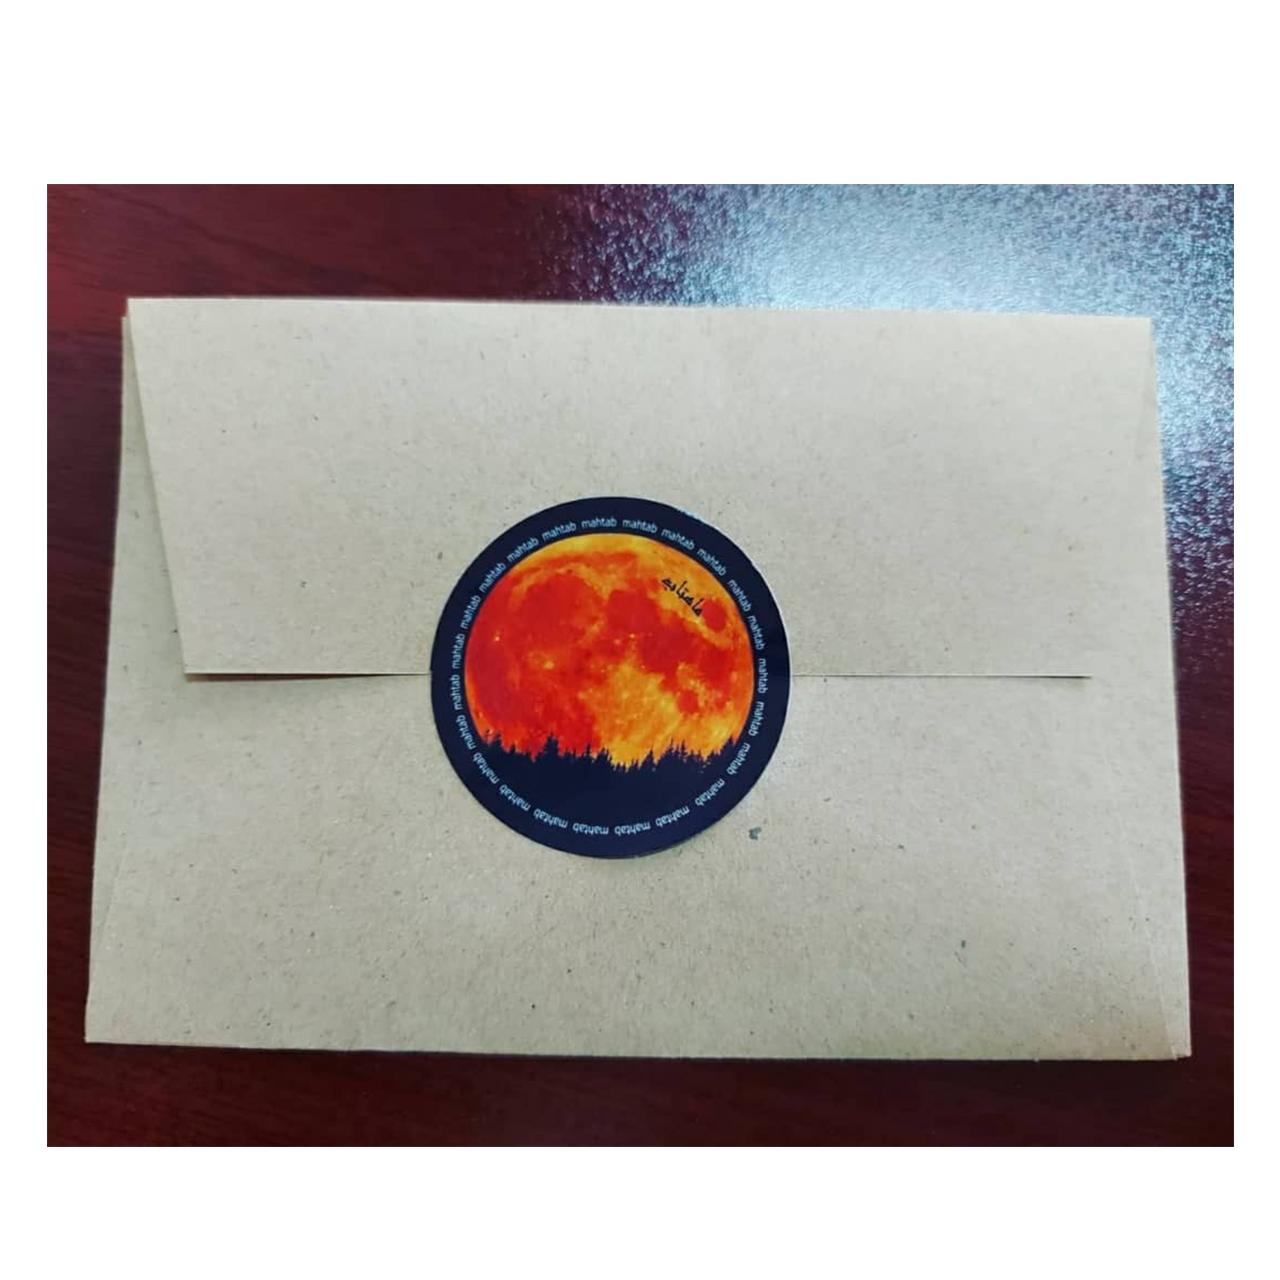 کارت پستال ماهتاب طرح عاشقتم دوست دارم کد 1911